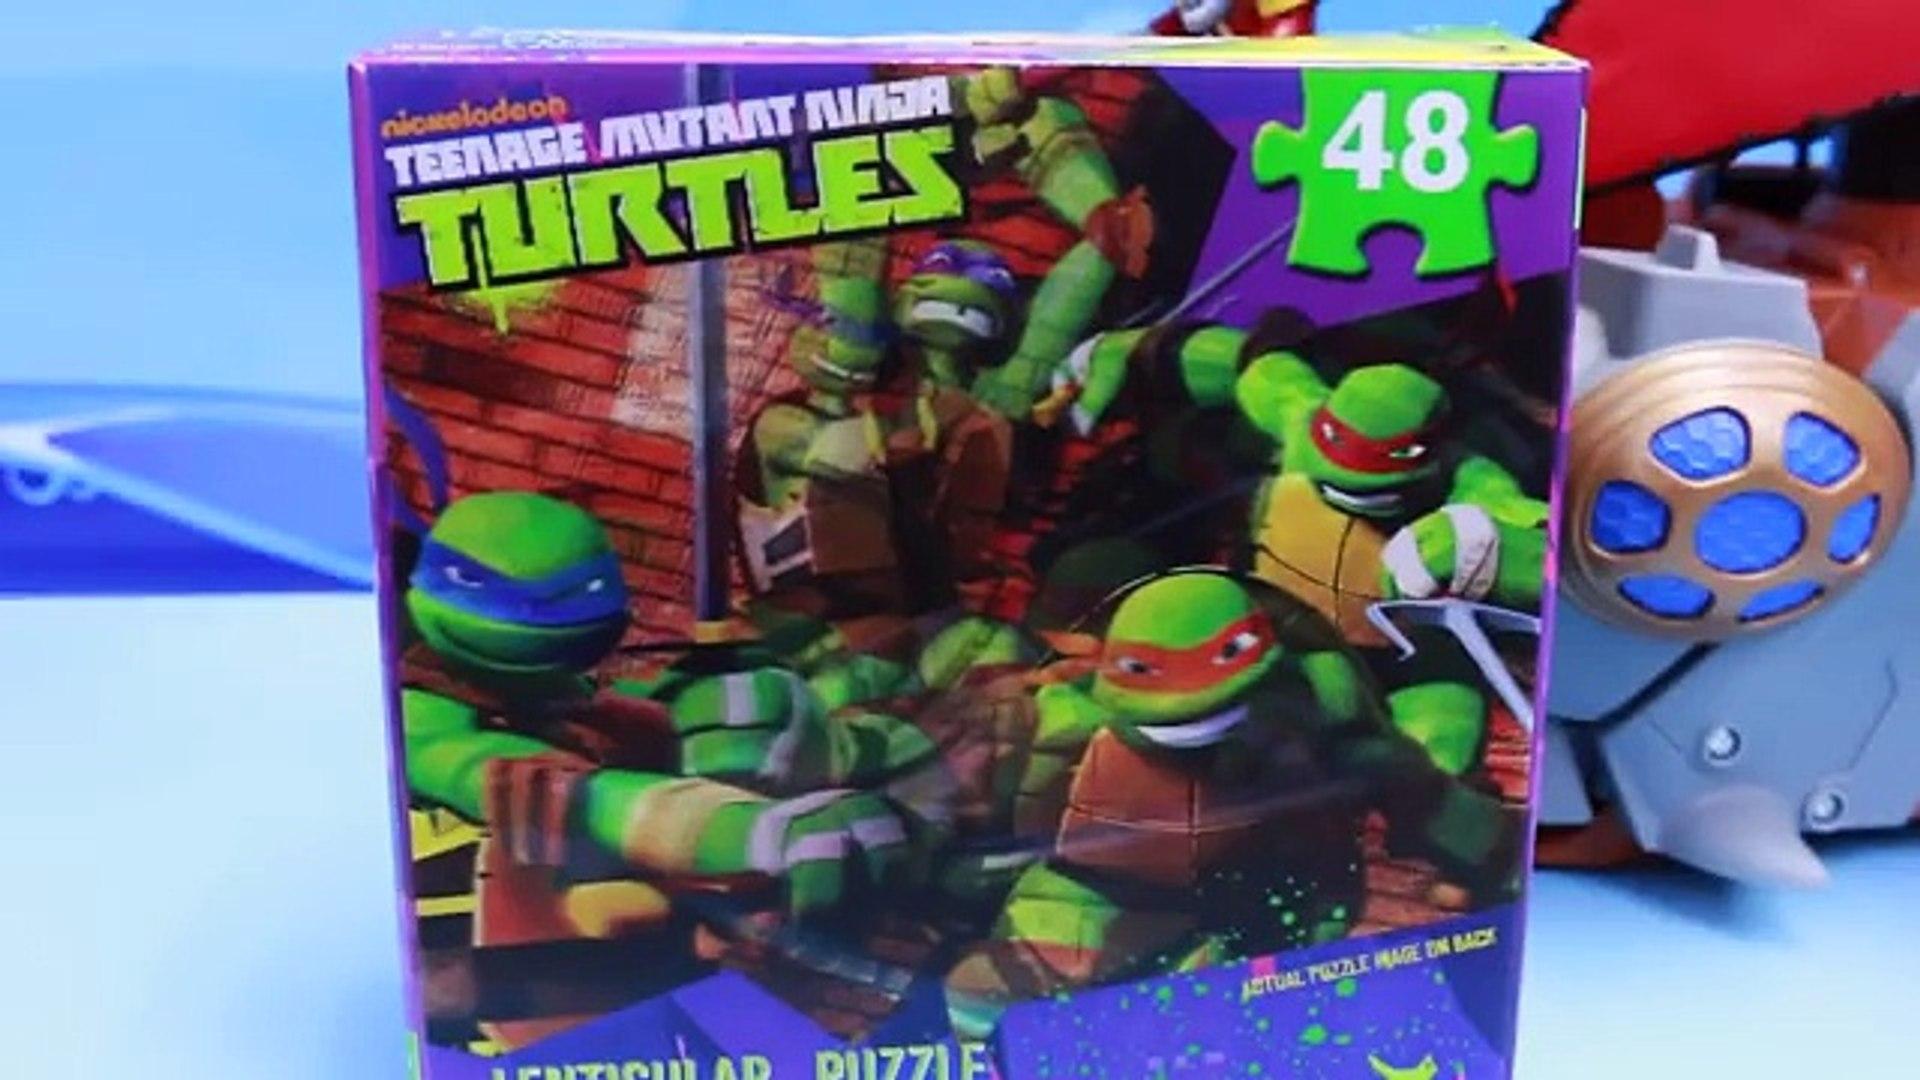 Teenage Mutant Ninja Turtles Toys Attacked by Imaginext Shark Pirate Ship Fishface Walks the Plank